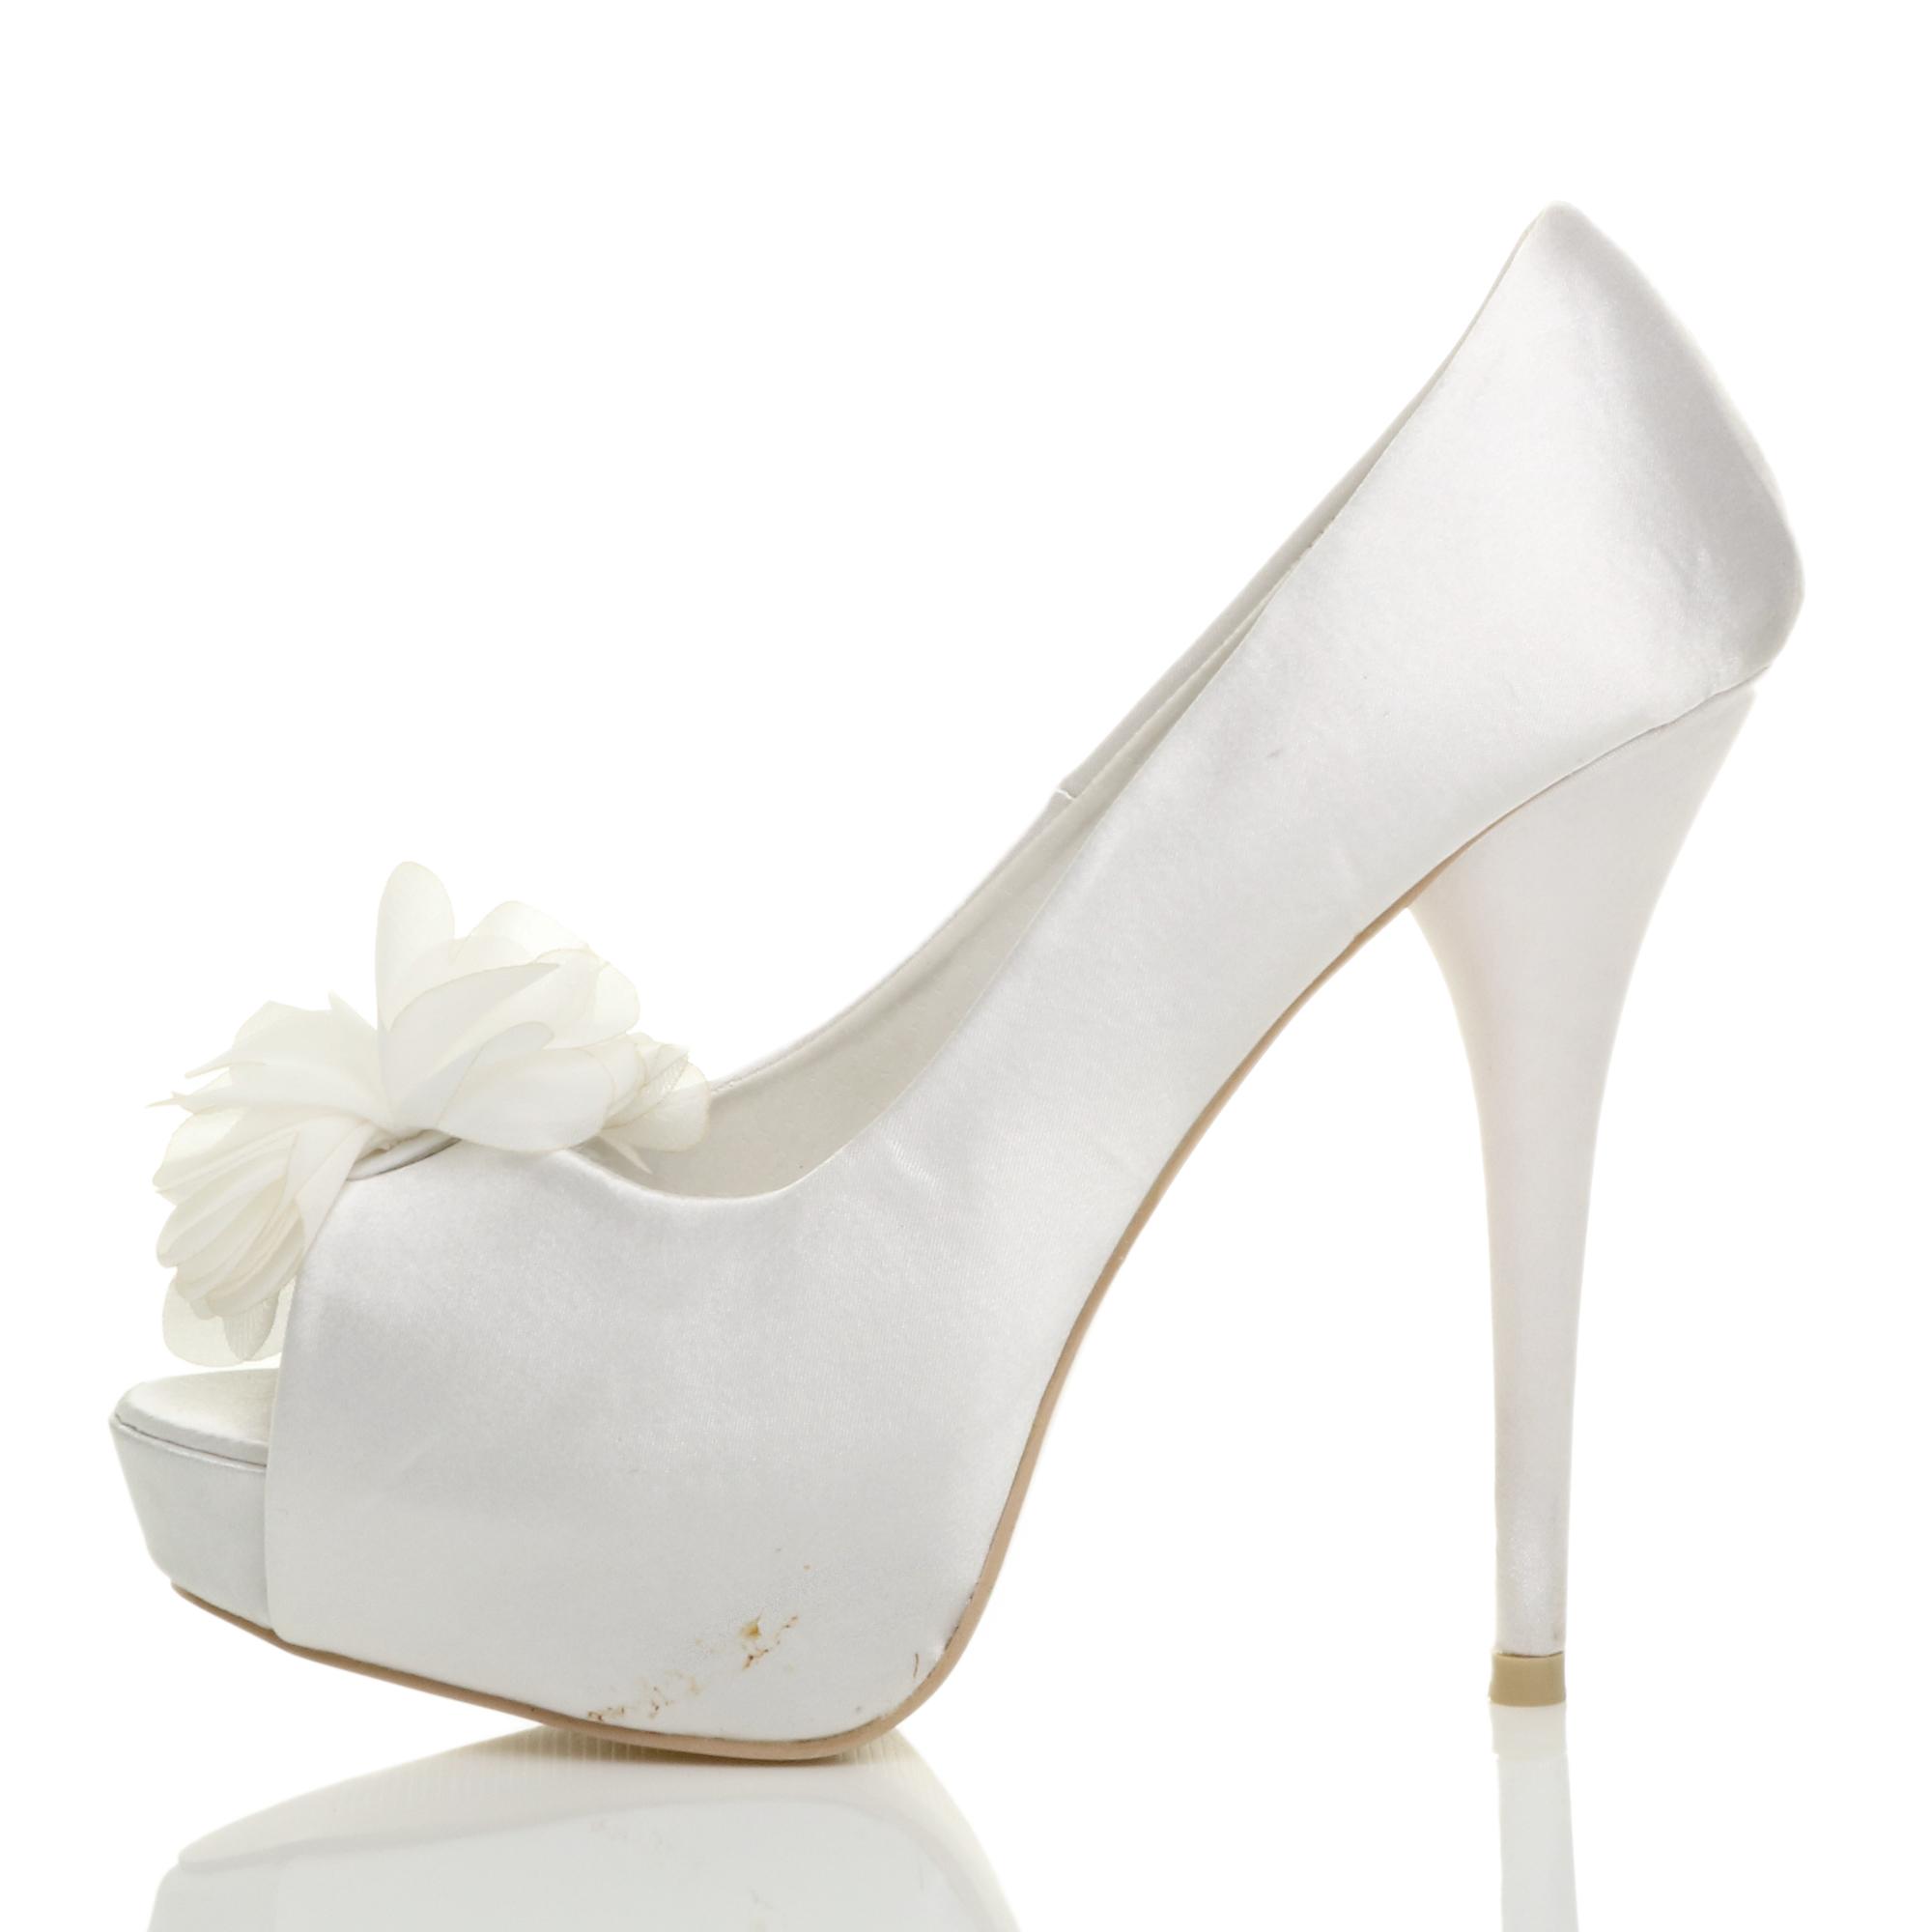 WOMENS-LADIES-HIGH-HEEL-WEDDING-BRIDAL-EVENING-PROM-PLATFORM-COURT-SHOES-SIZE